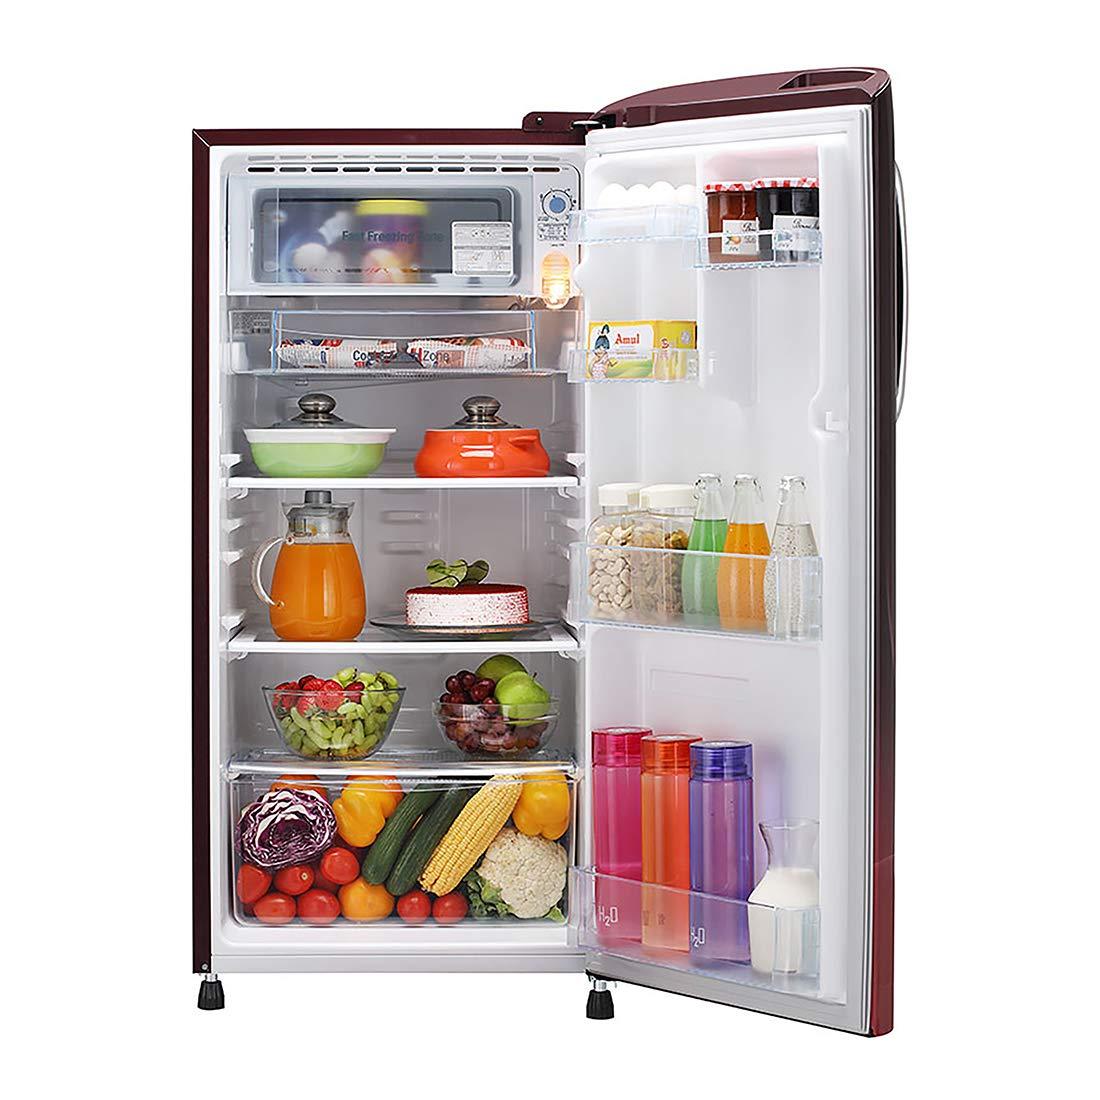 LG best refrigerator brands in India 2020